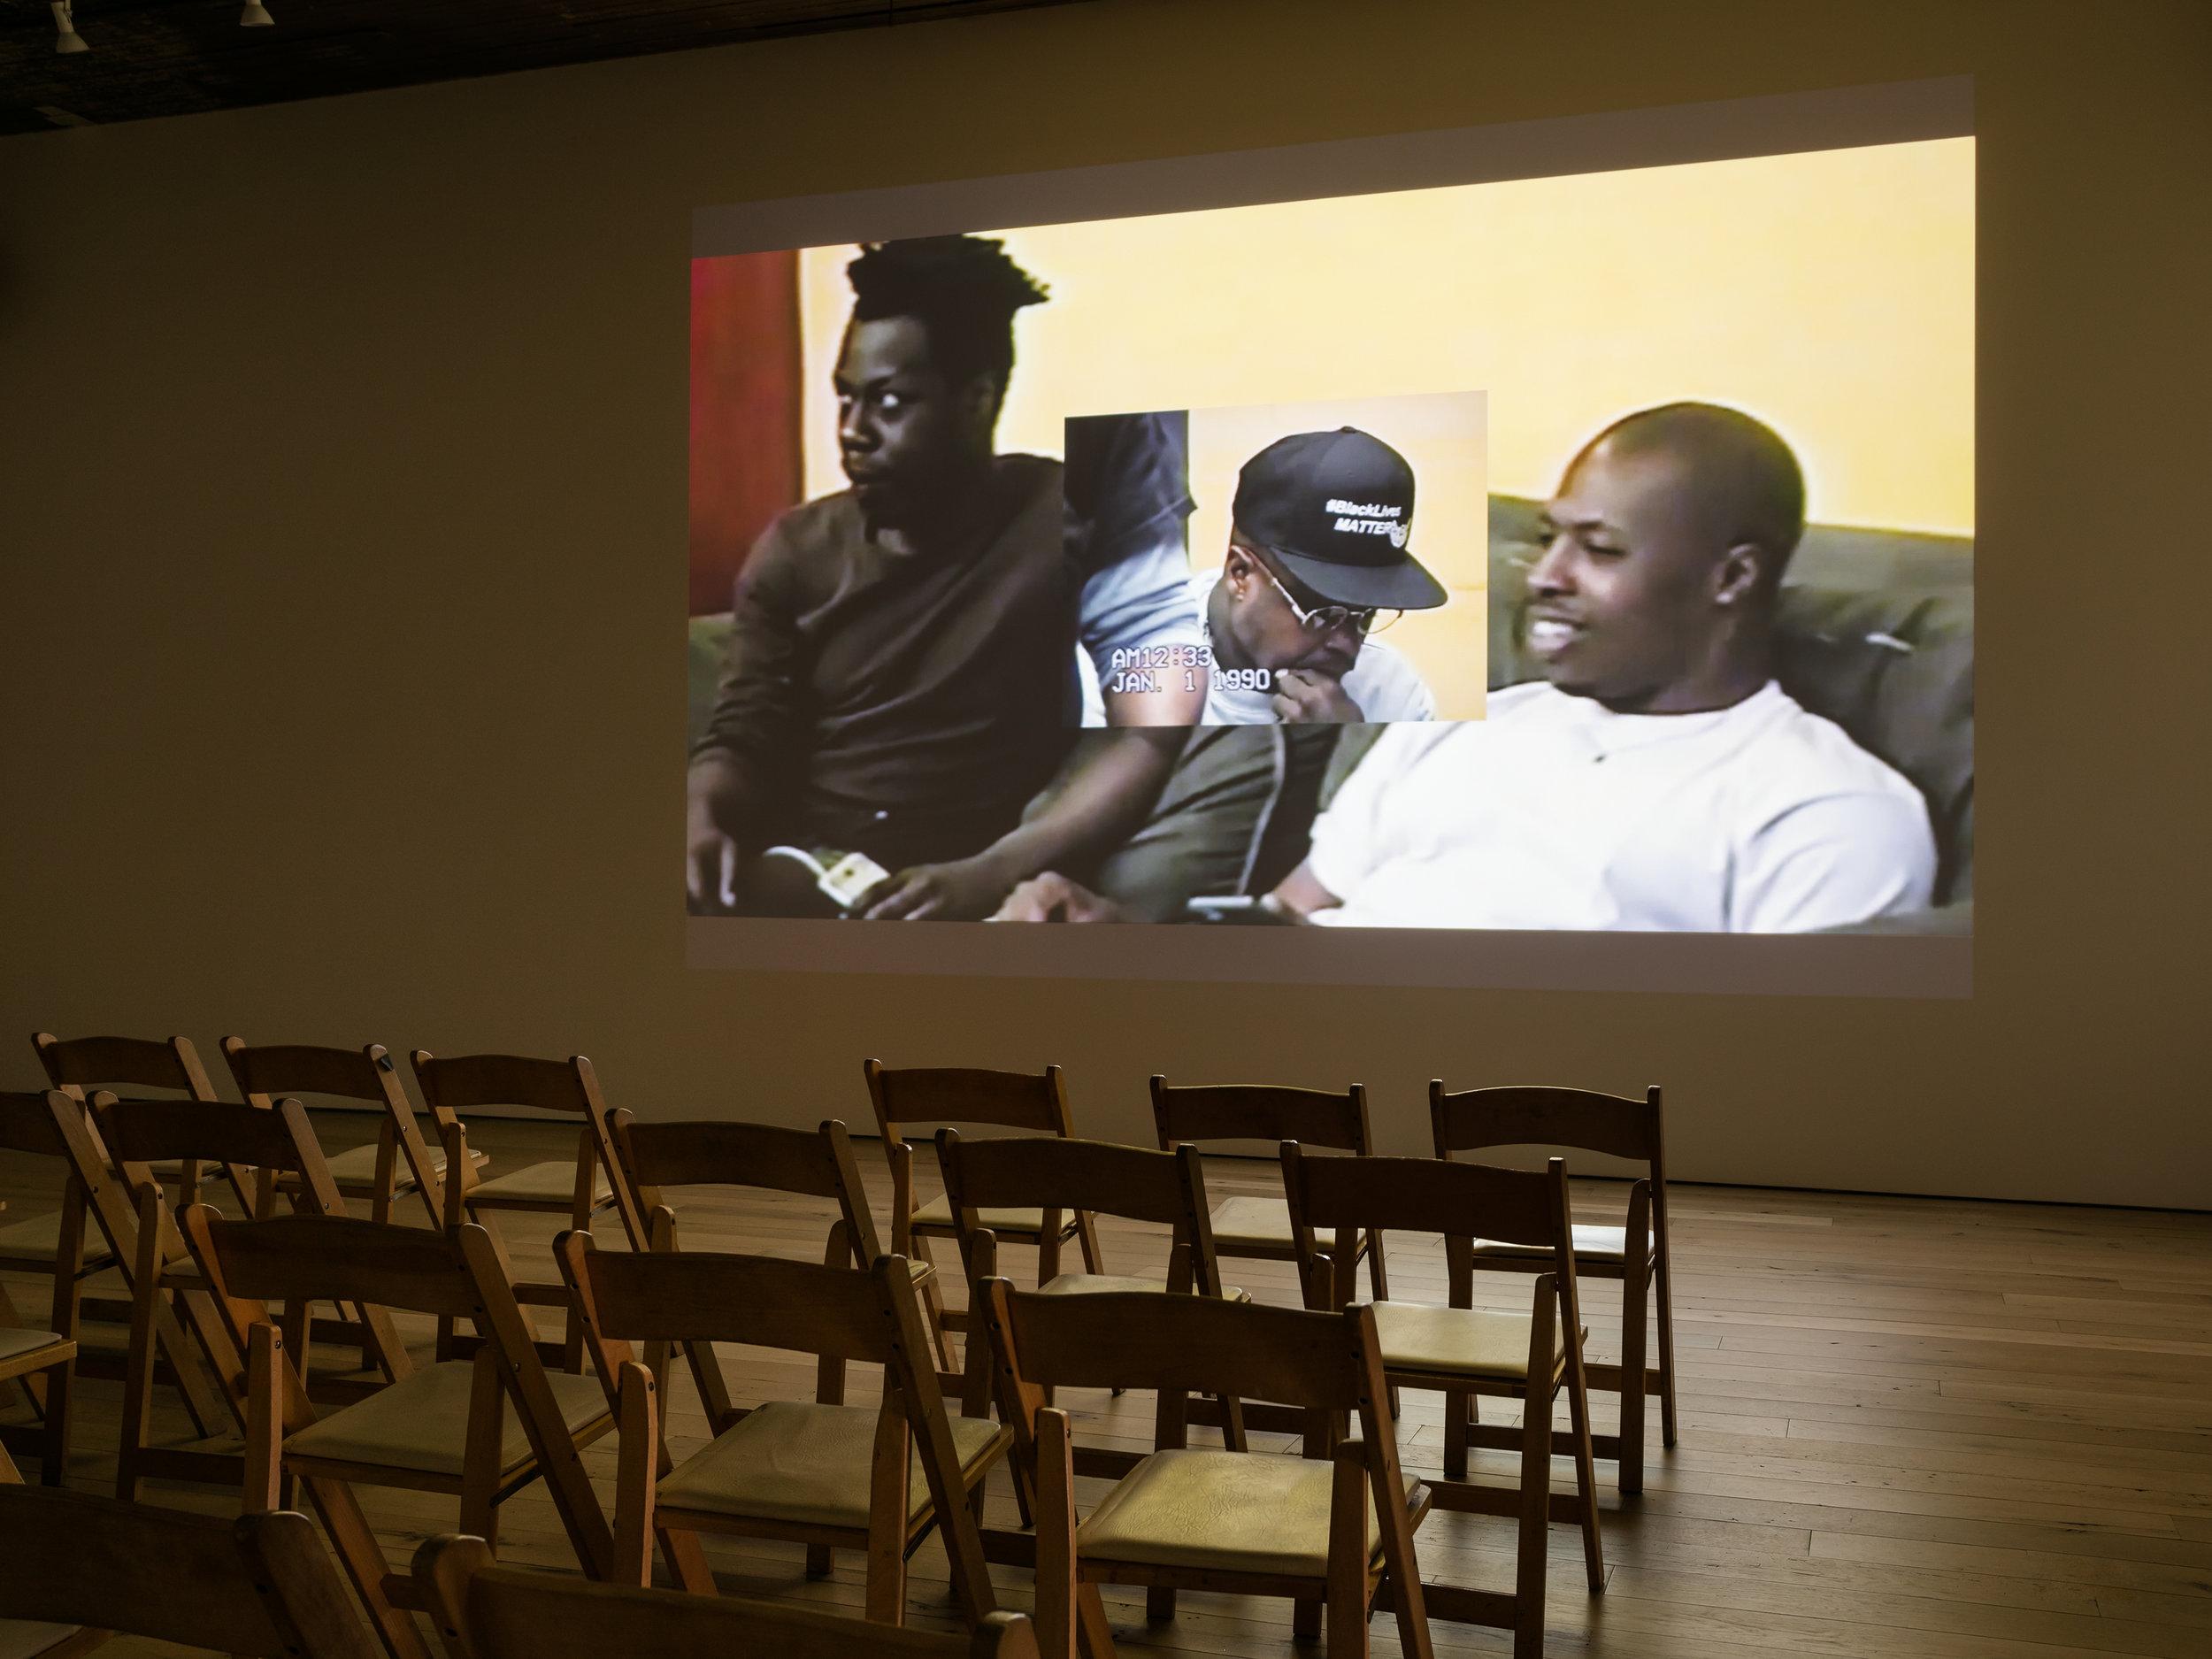 Installation View,  EBSPLOITATION , Martos Gallery, New York, NY 2019